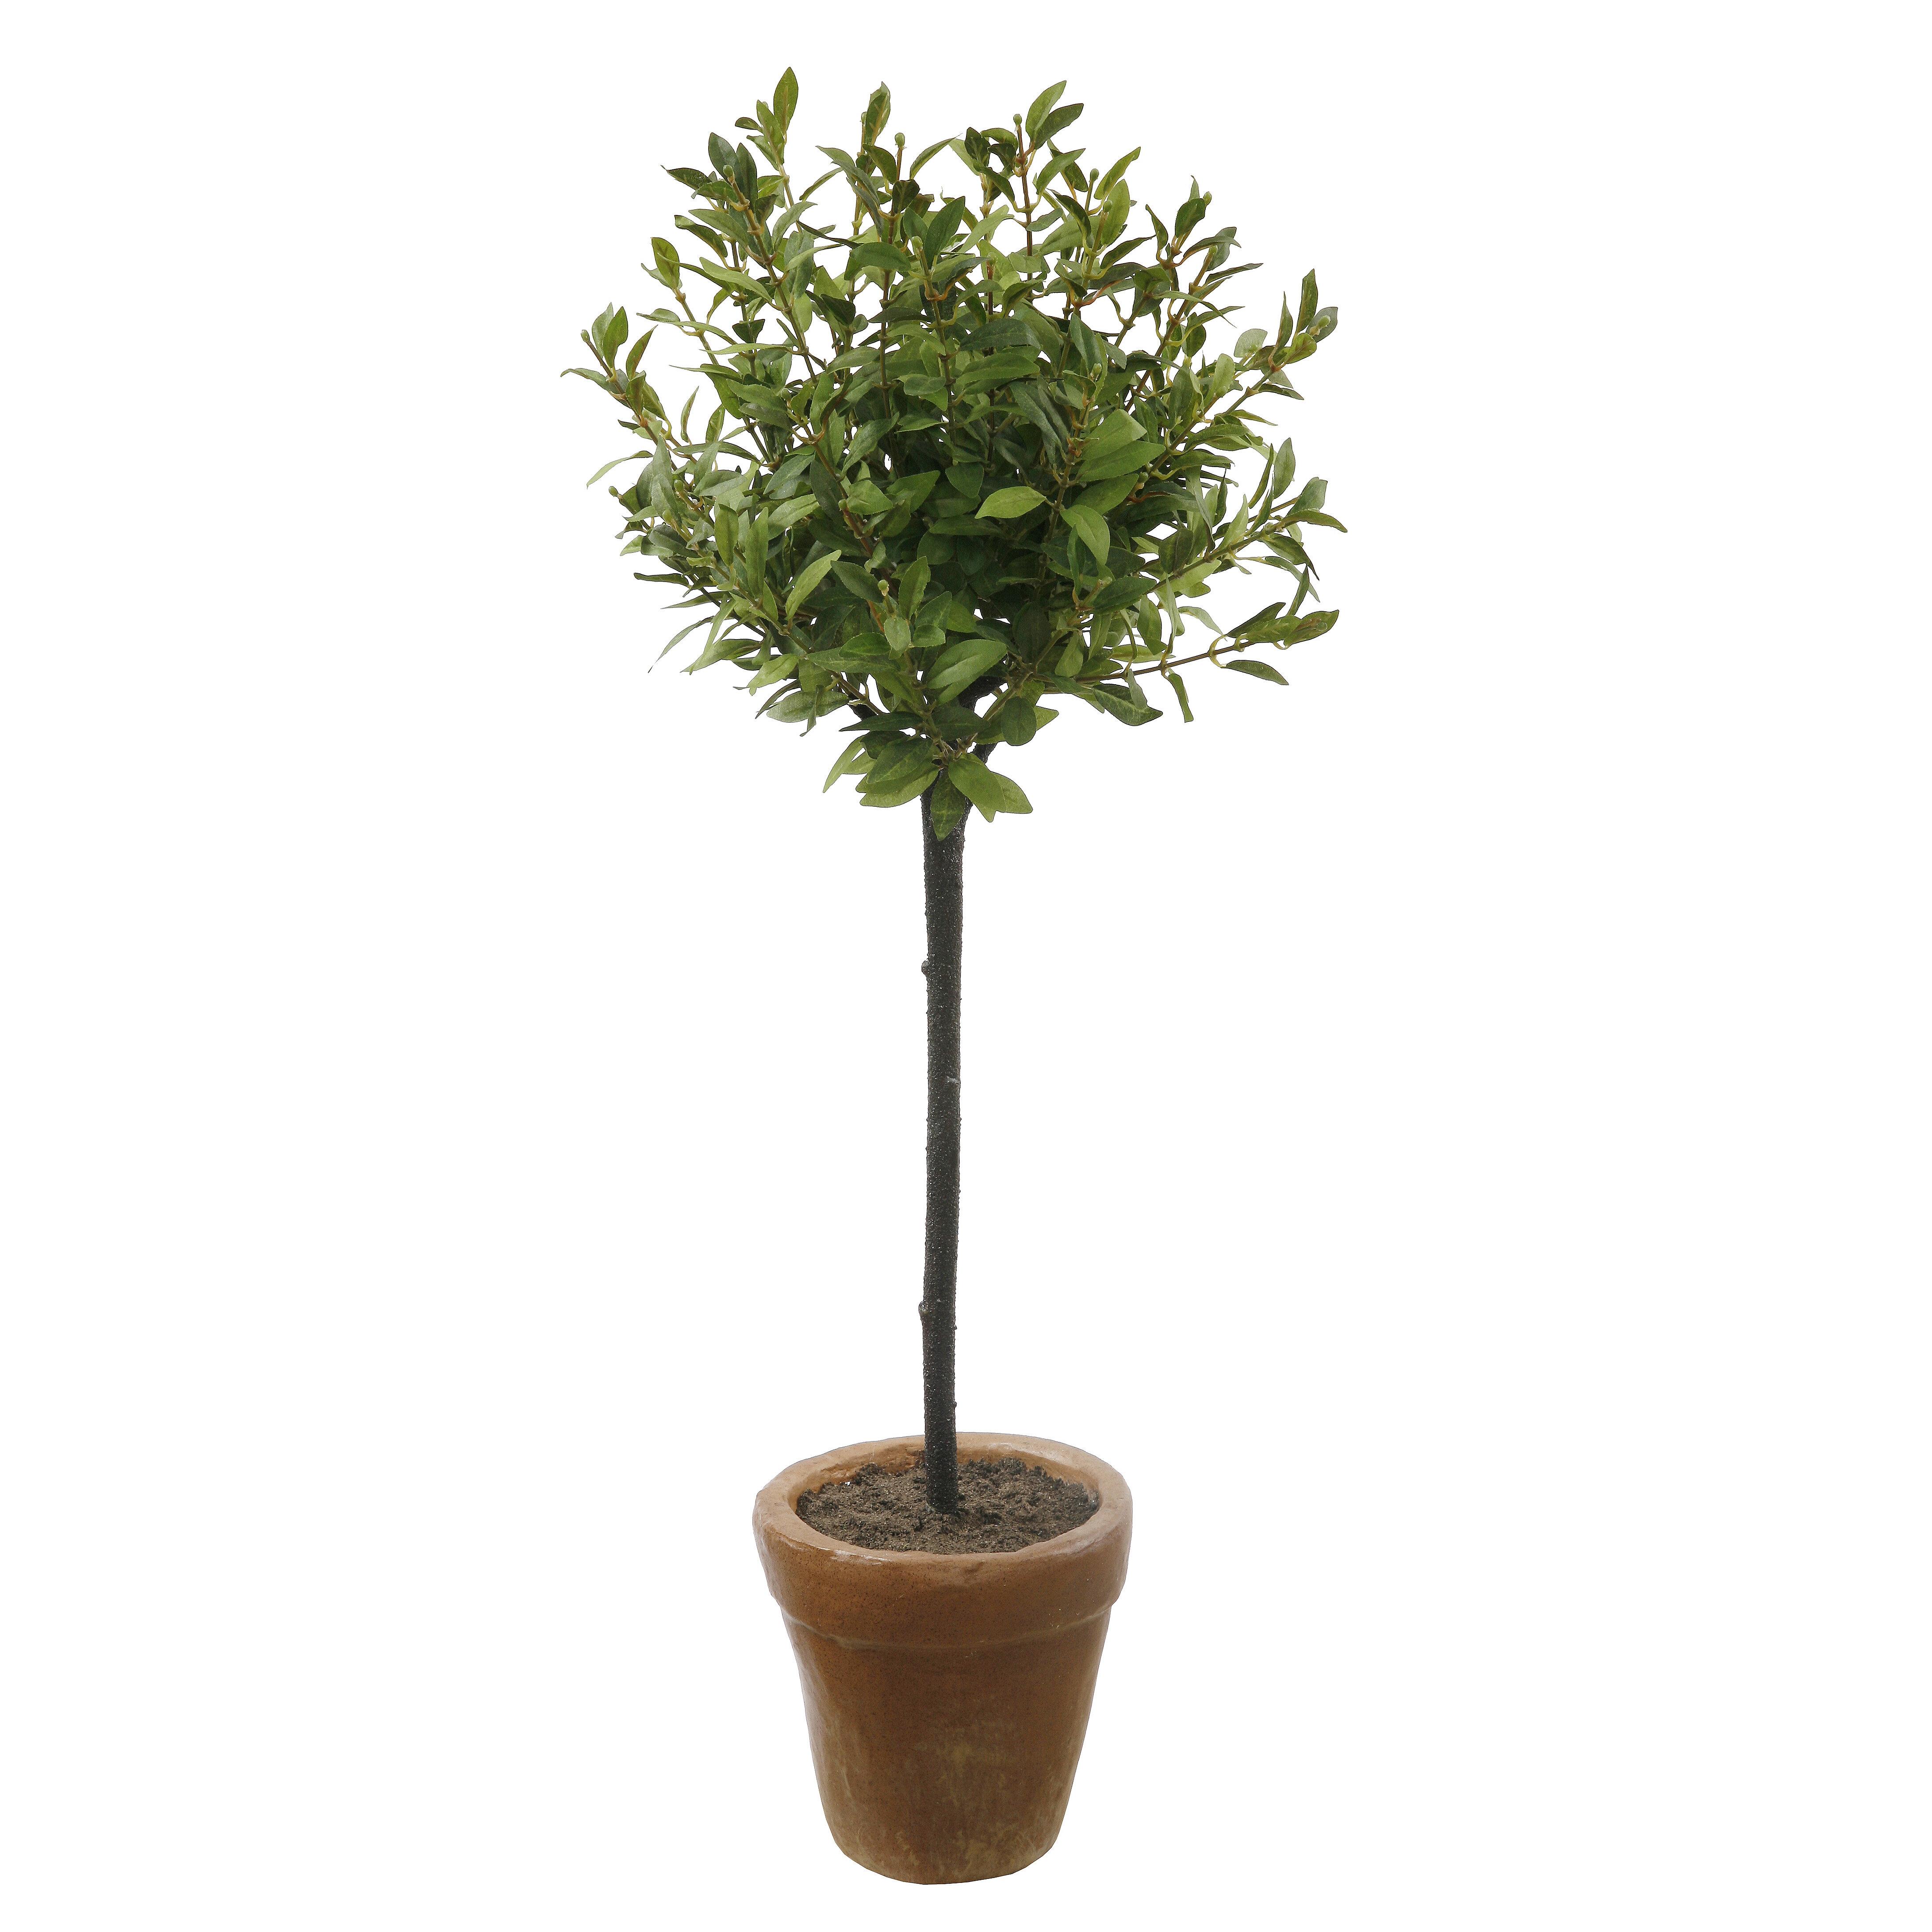 Winward Silks Myrtle Foliage Topiary In Pot Reviews Wayfair